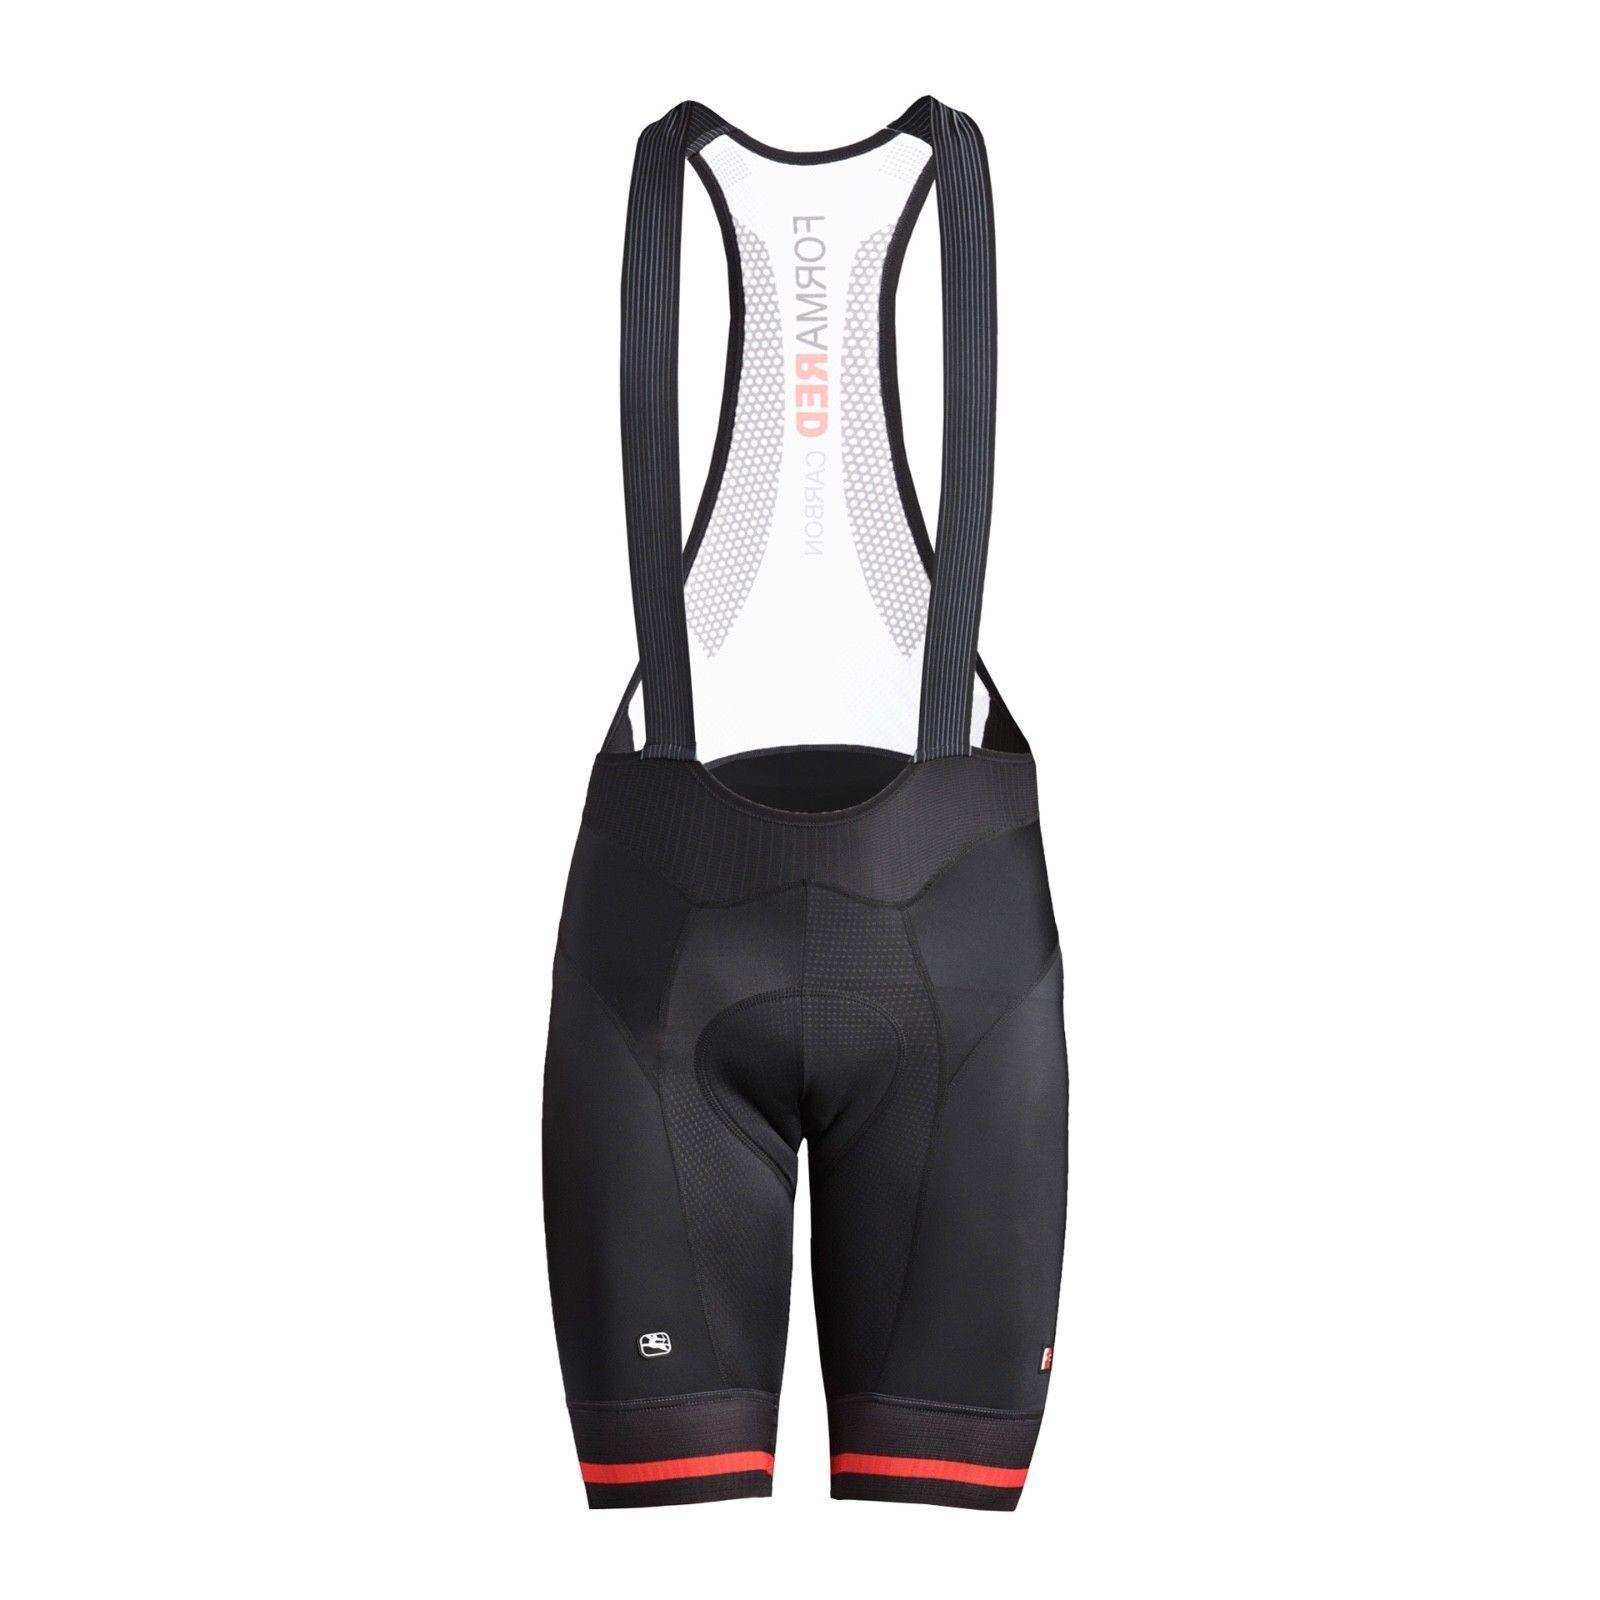 Giordana ciclismo Baberos Pantalón Corto Fr-PRO   Para Hombre-Negro C rojo   Nuevo